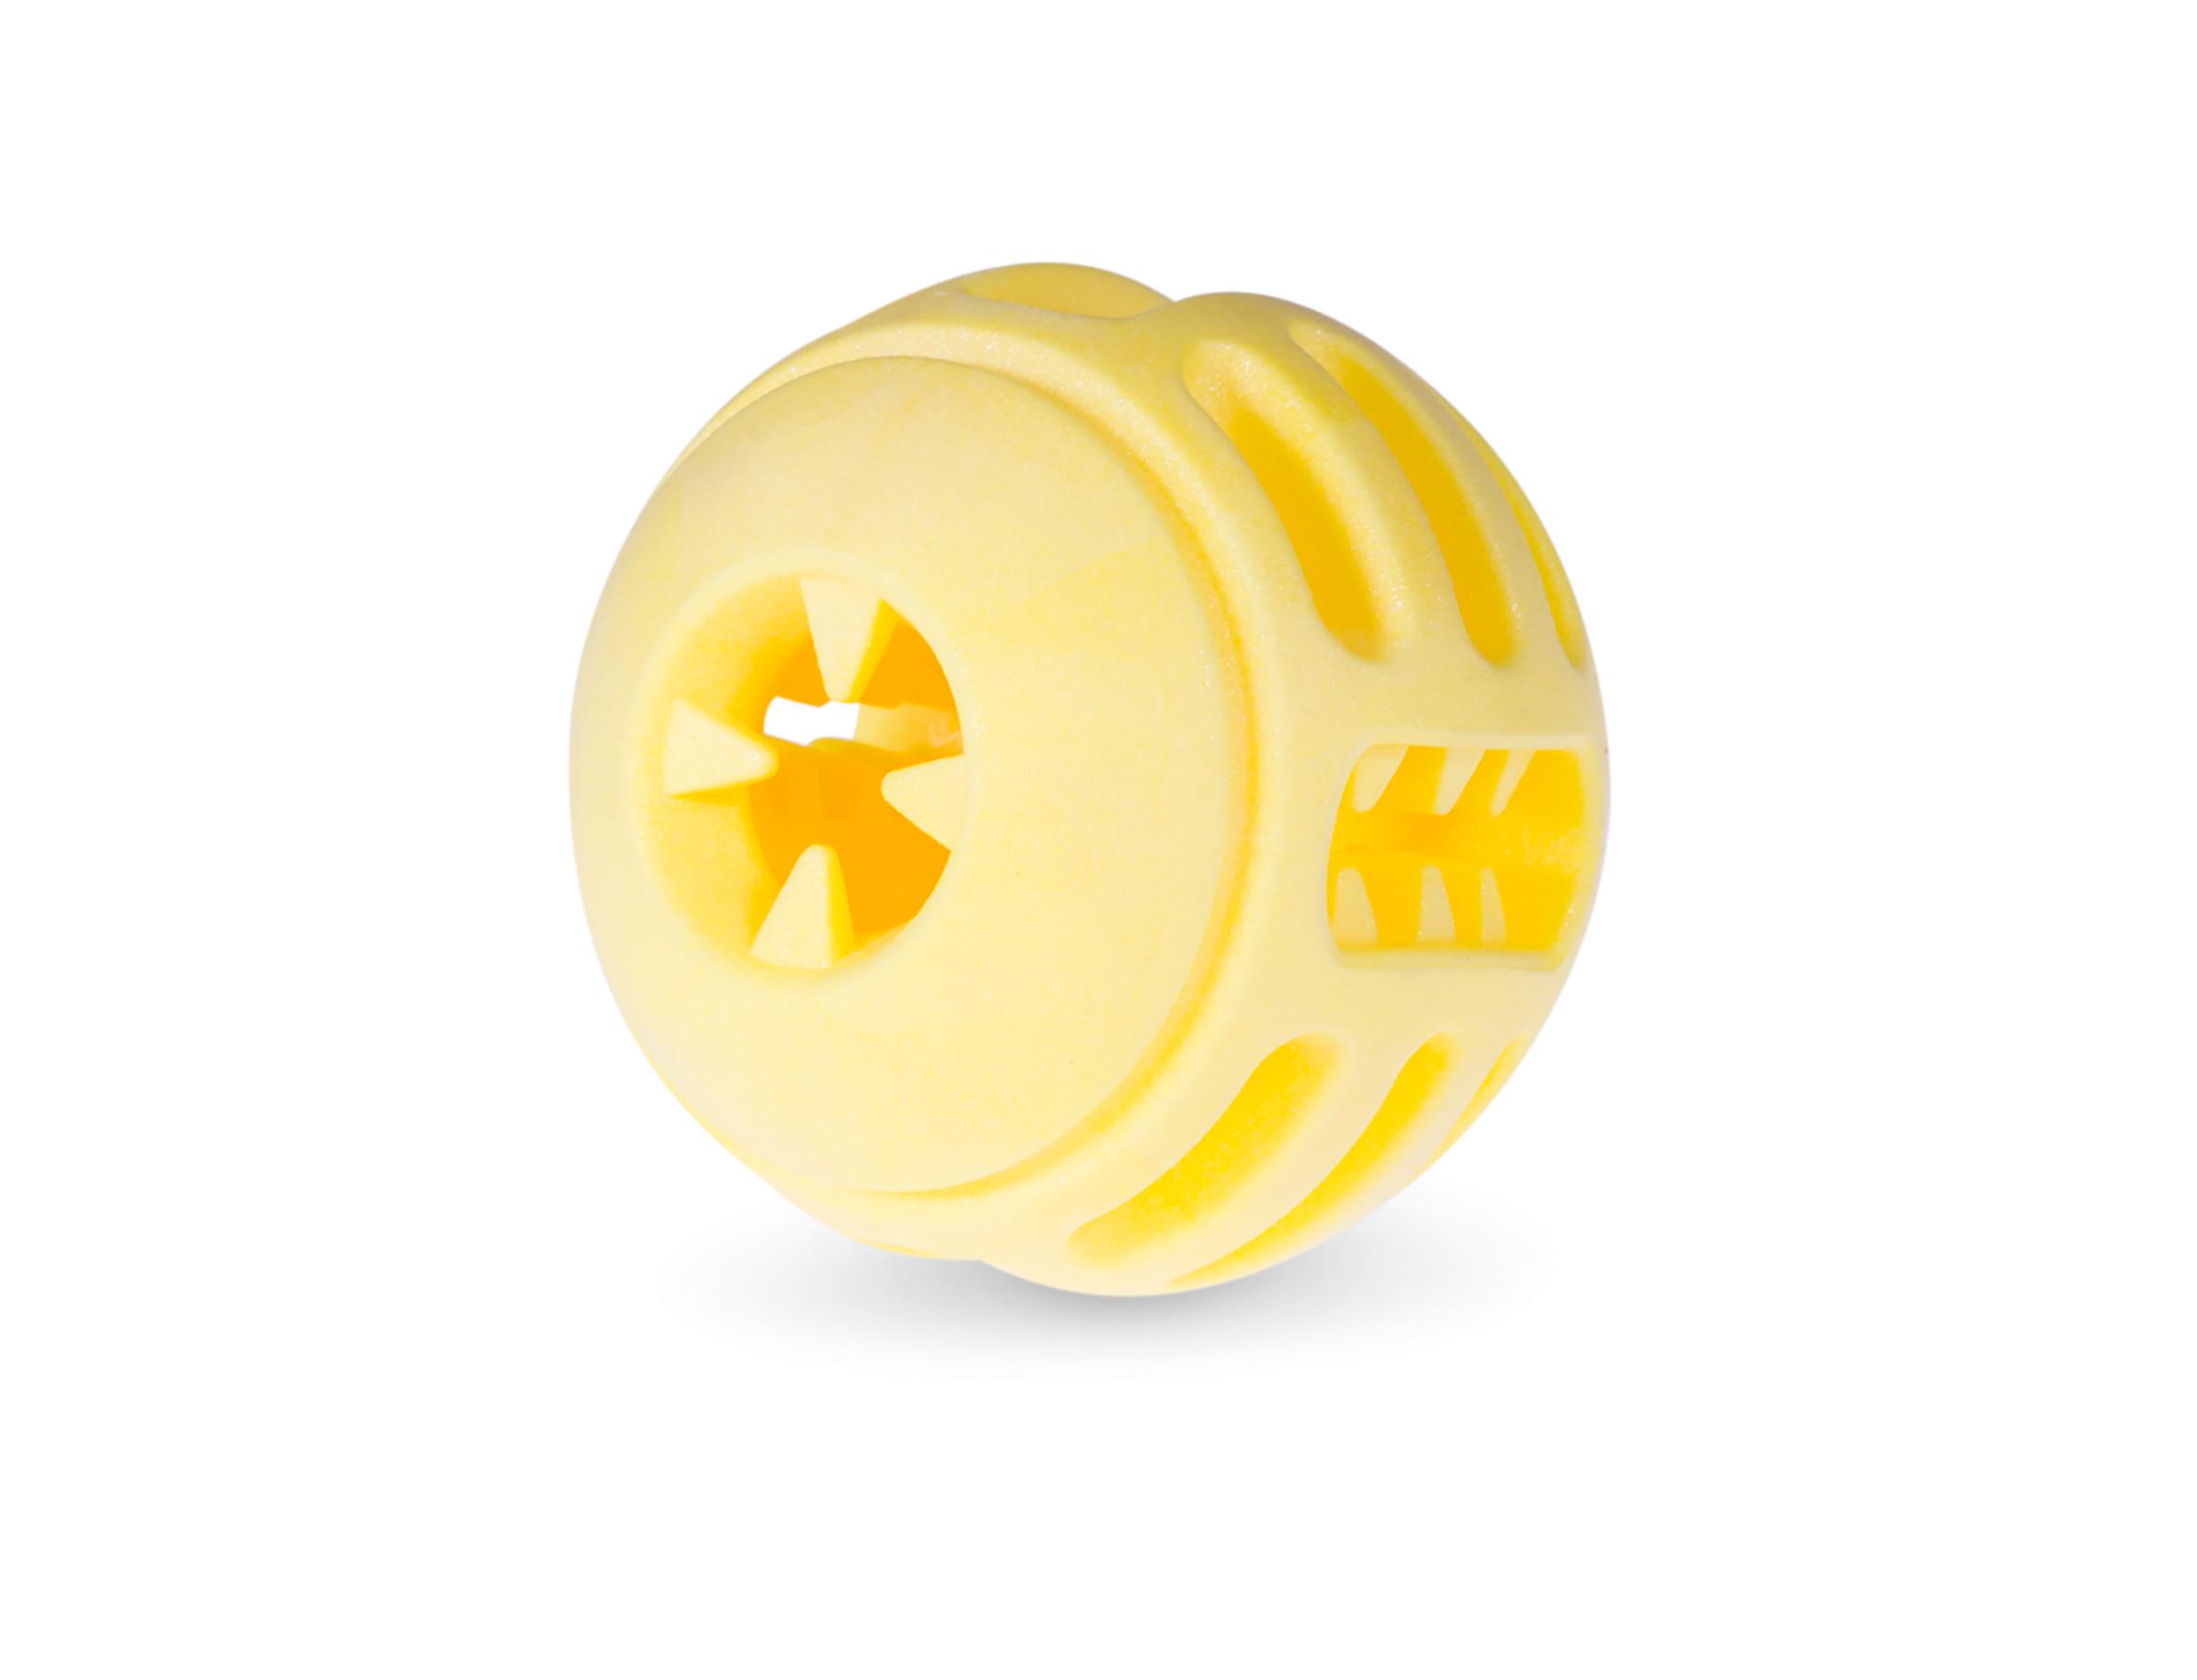 VDG TPR Vanilla Yellow Ball kamuoliukas šuniui 8cm